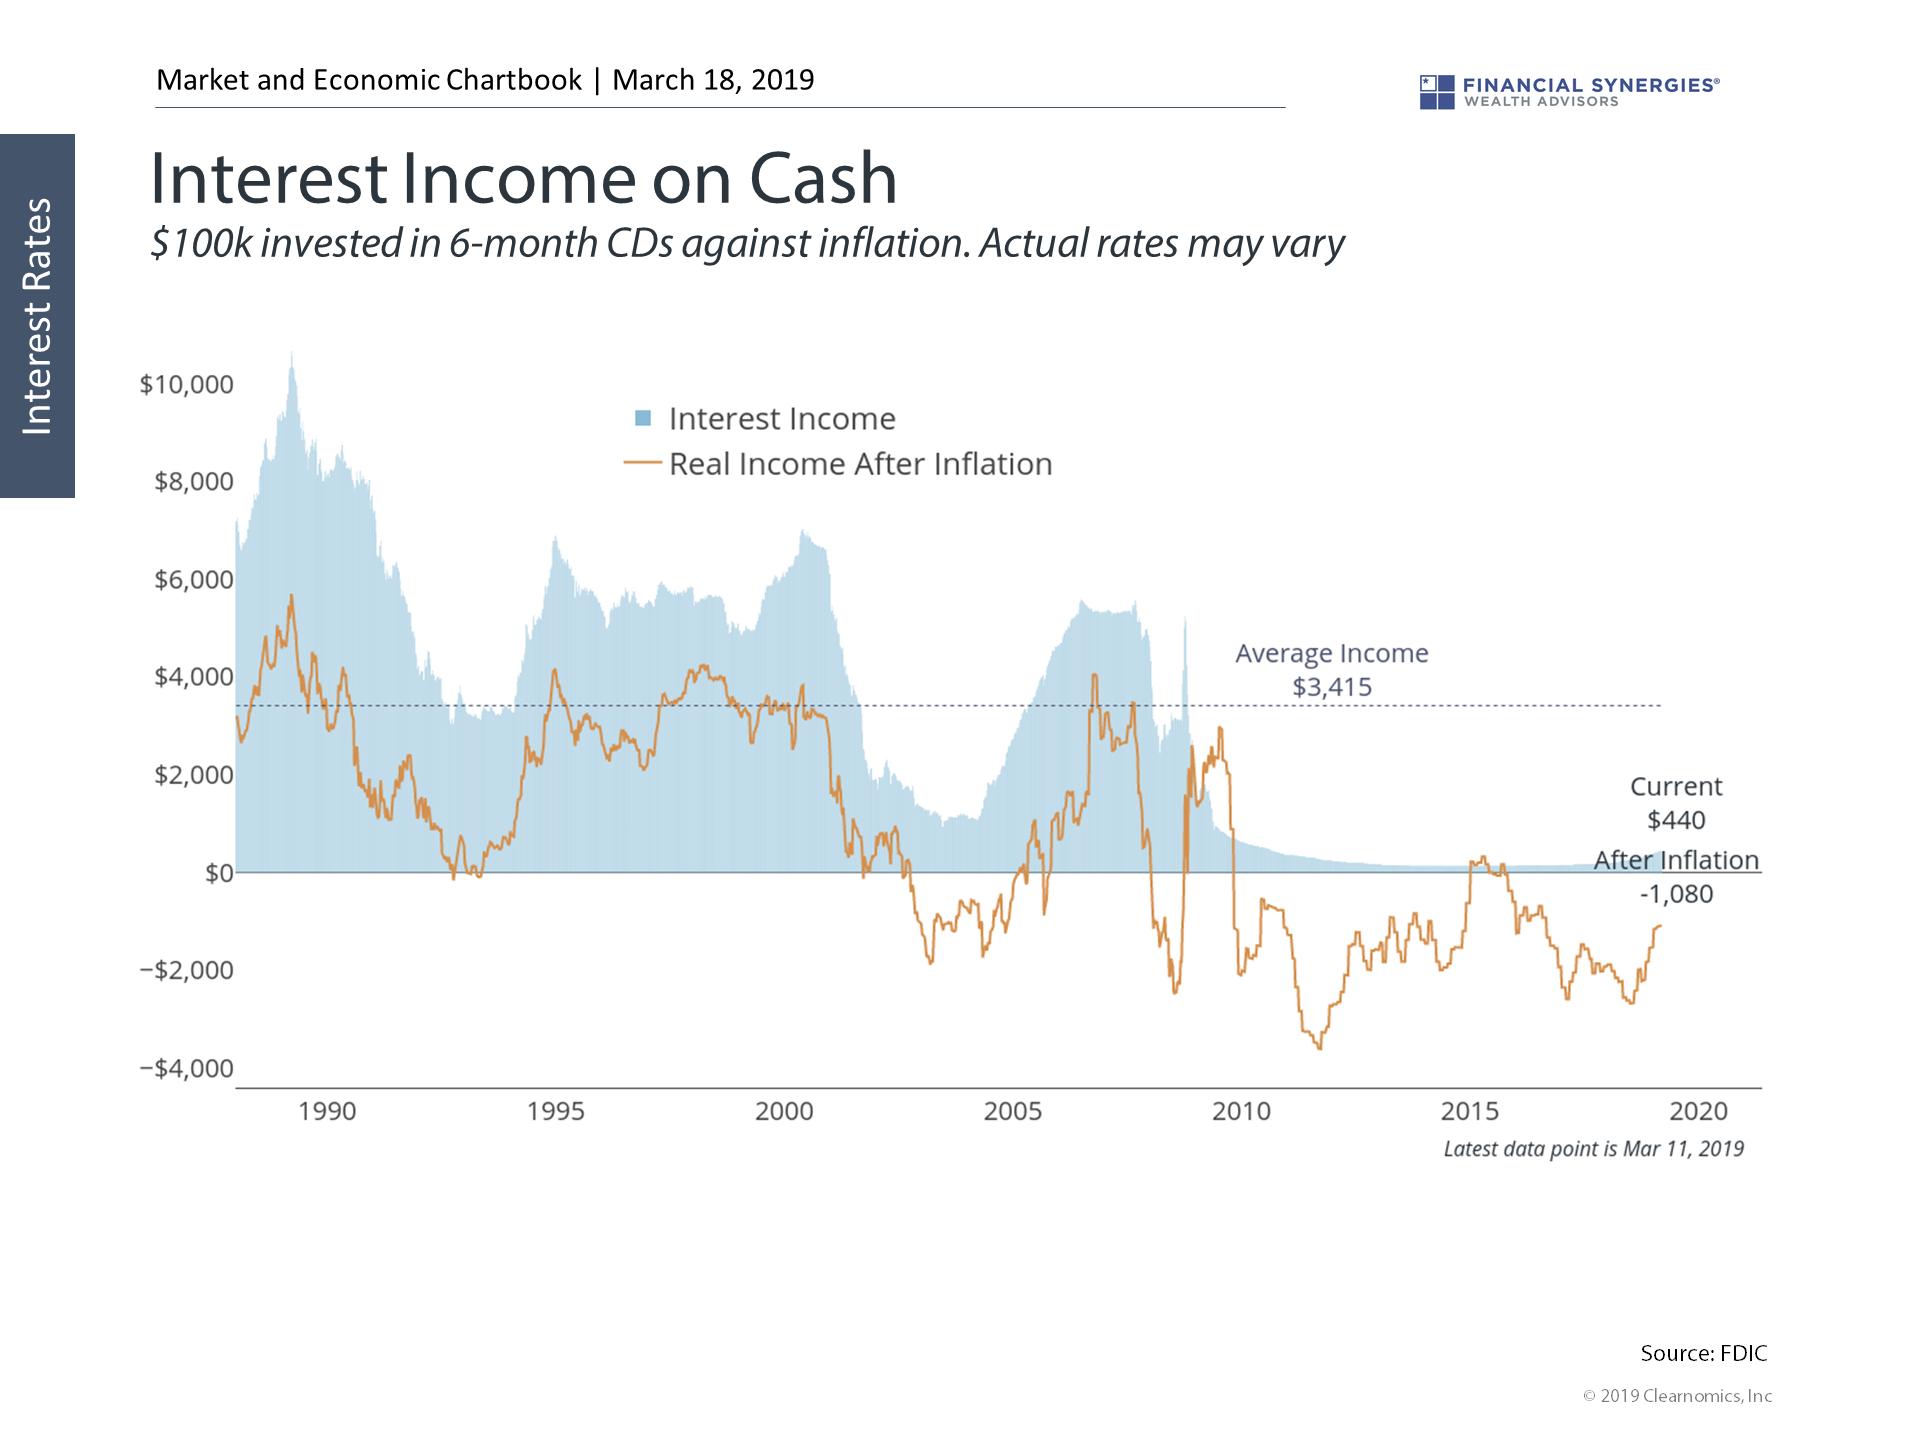 Interest Income on Cash